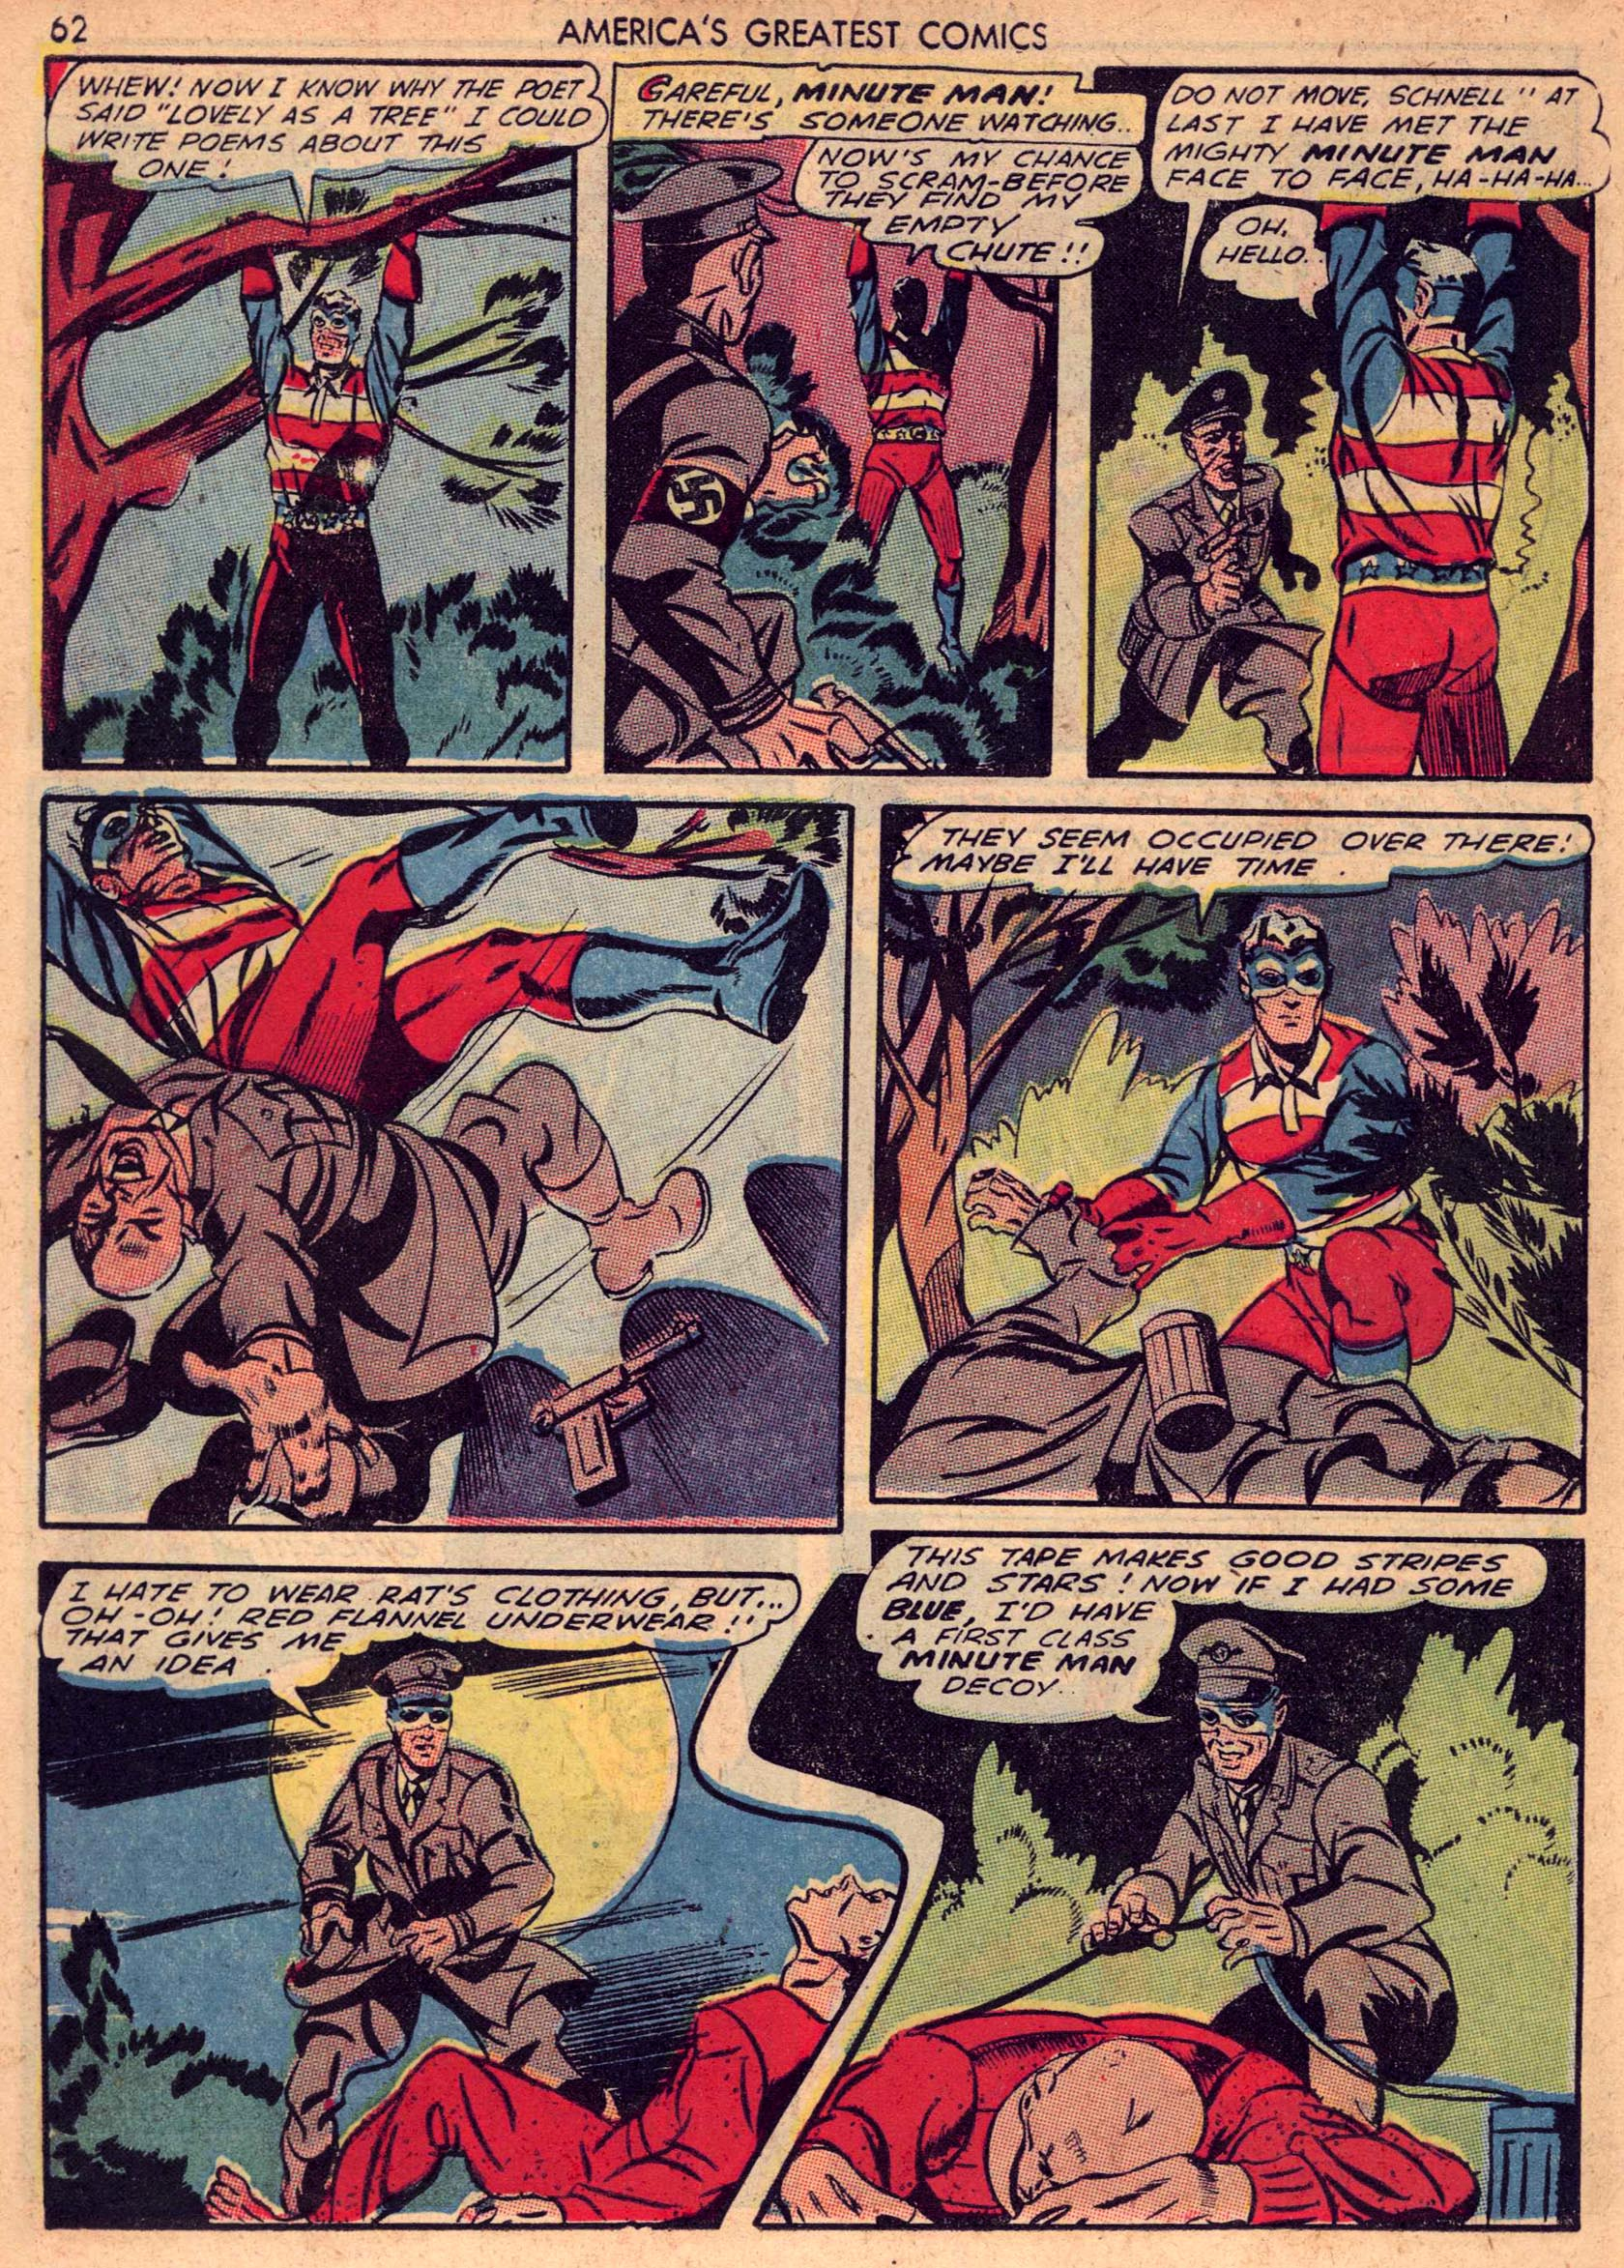 Read online America's Greatest Comics comic -  Issue #7 - 61